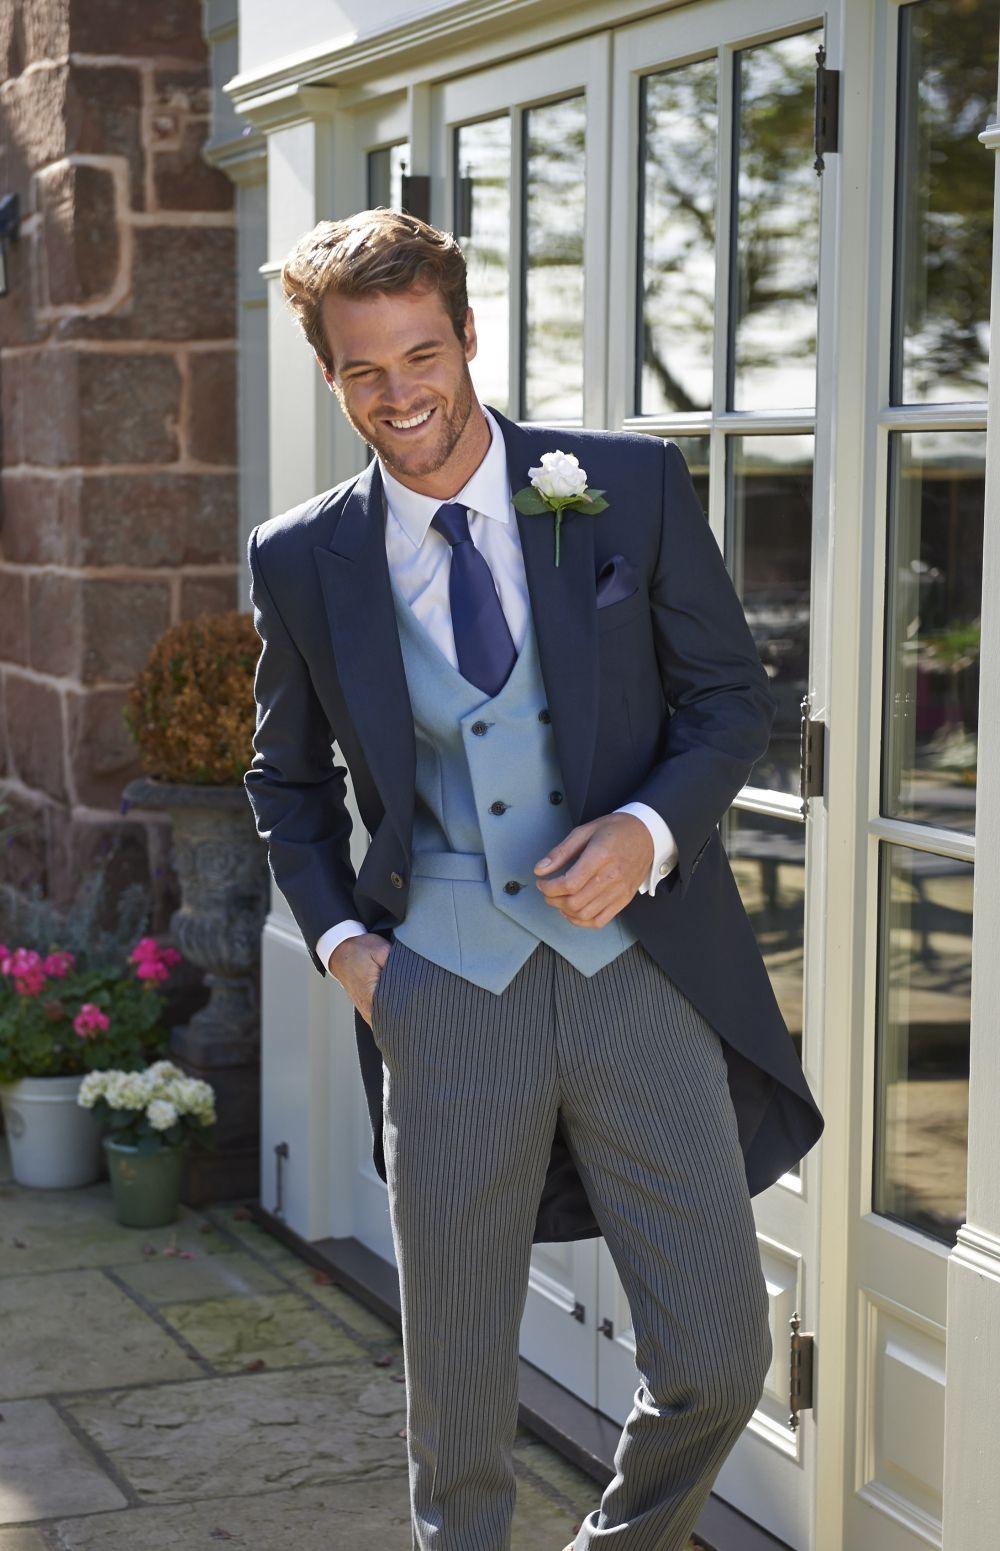 449d1b3d10a6 Forton - Tailcoats - Wedding Suits